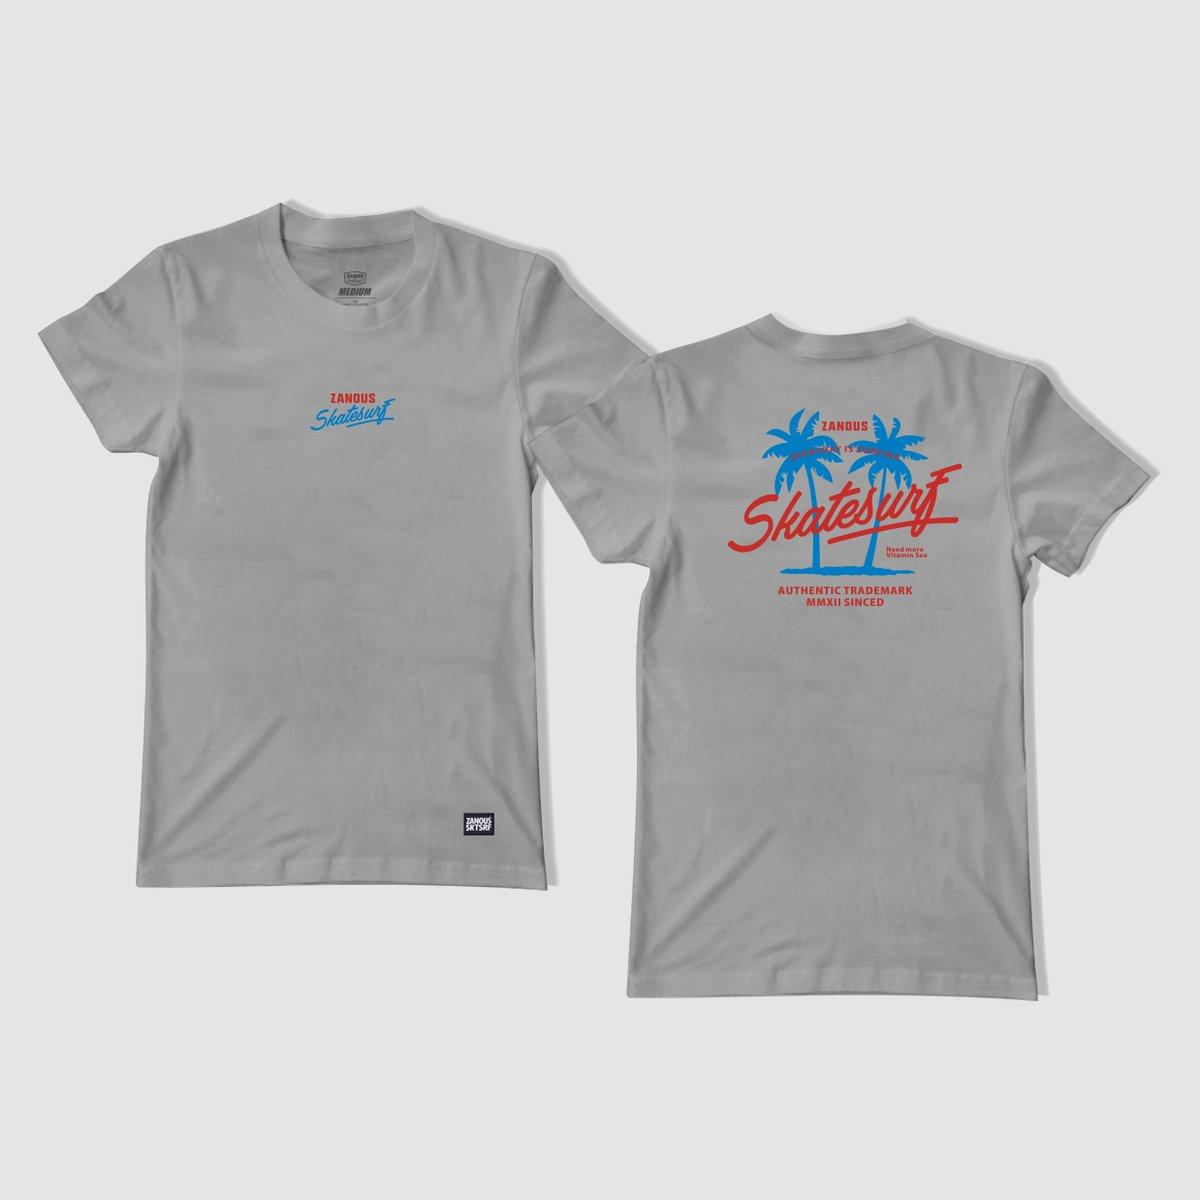 T-Shirt. Material : Cotton 30s Price : 125.000 . For order please contact : Wa : 082214180880 Shopee : Zuldazanous #zanousgangs #distrobandung #fashion #ootd #pants #skate #surf #jakarta #makasar #jepara #kudus